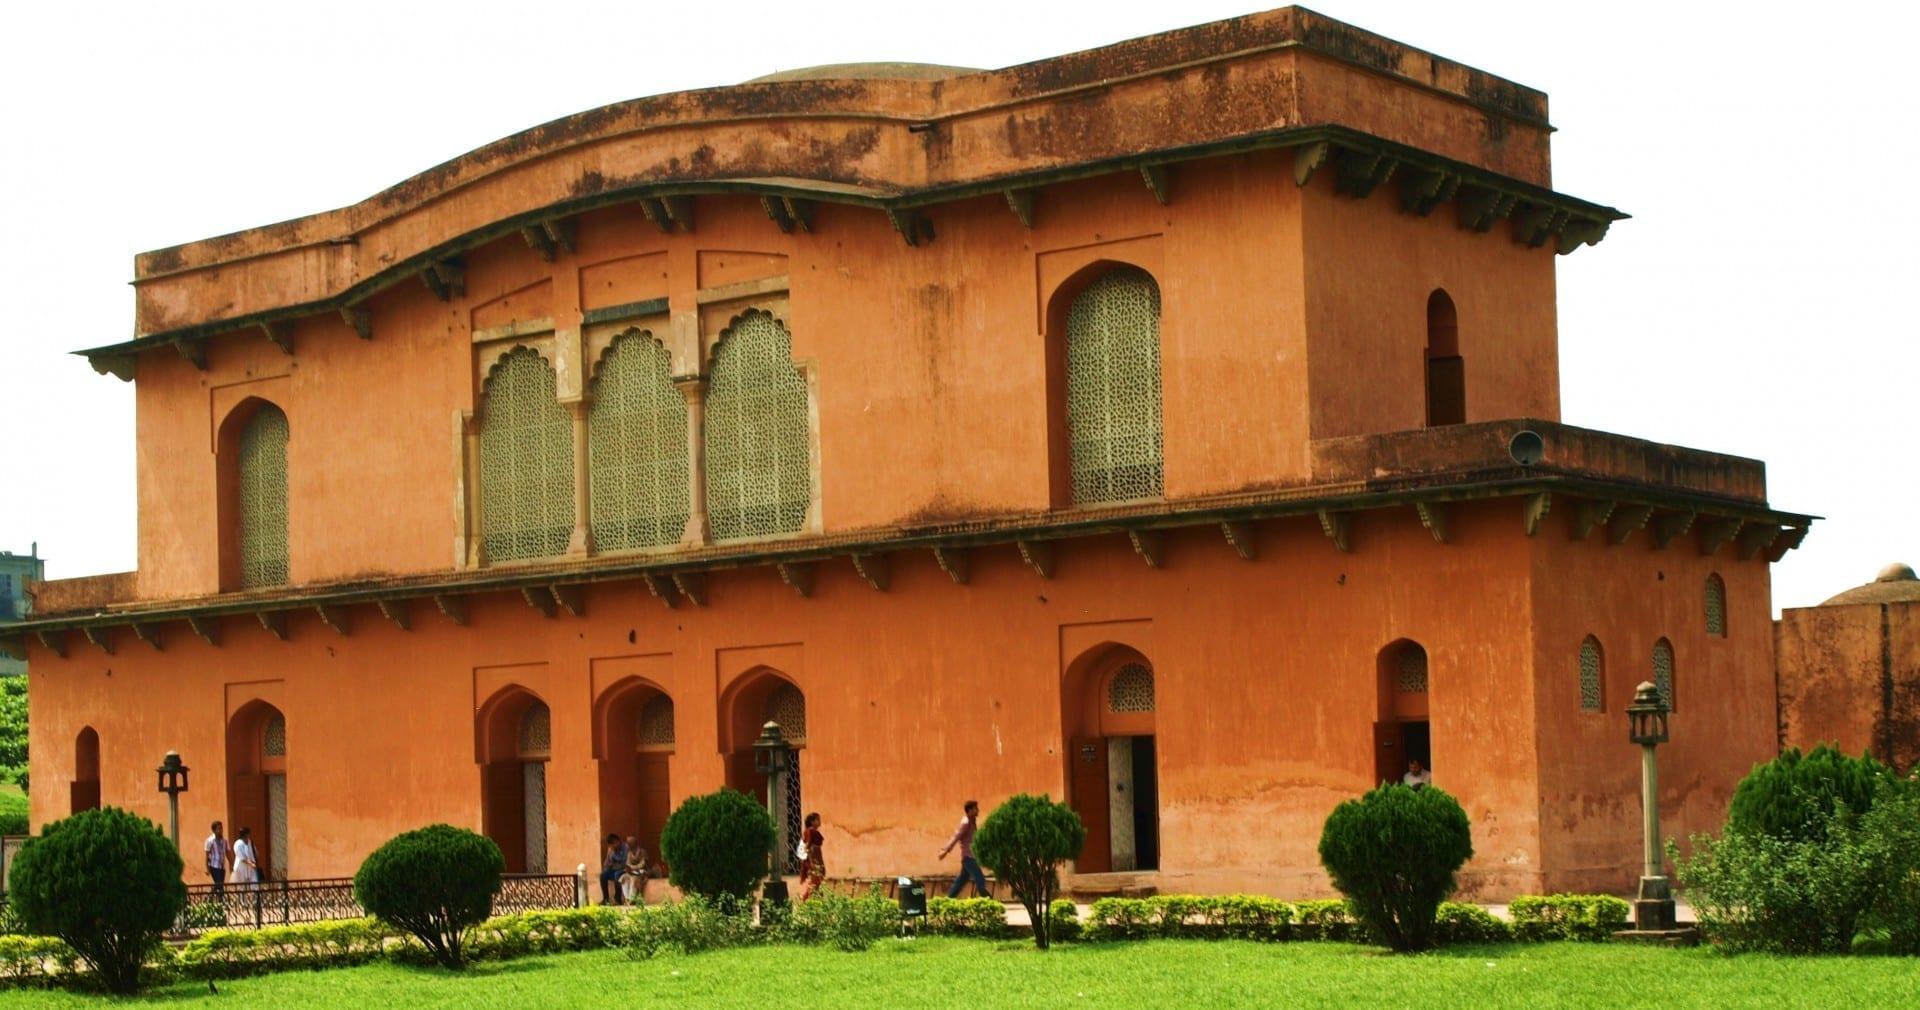 El Fuerte Mughal Lalbagh del siglo XVII Daca Bangladesh